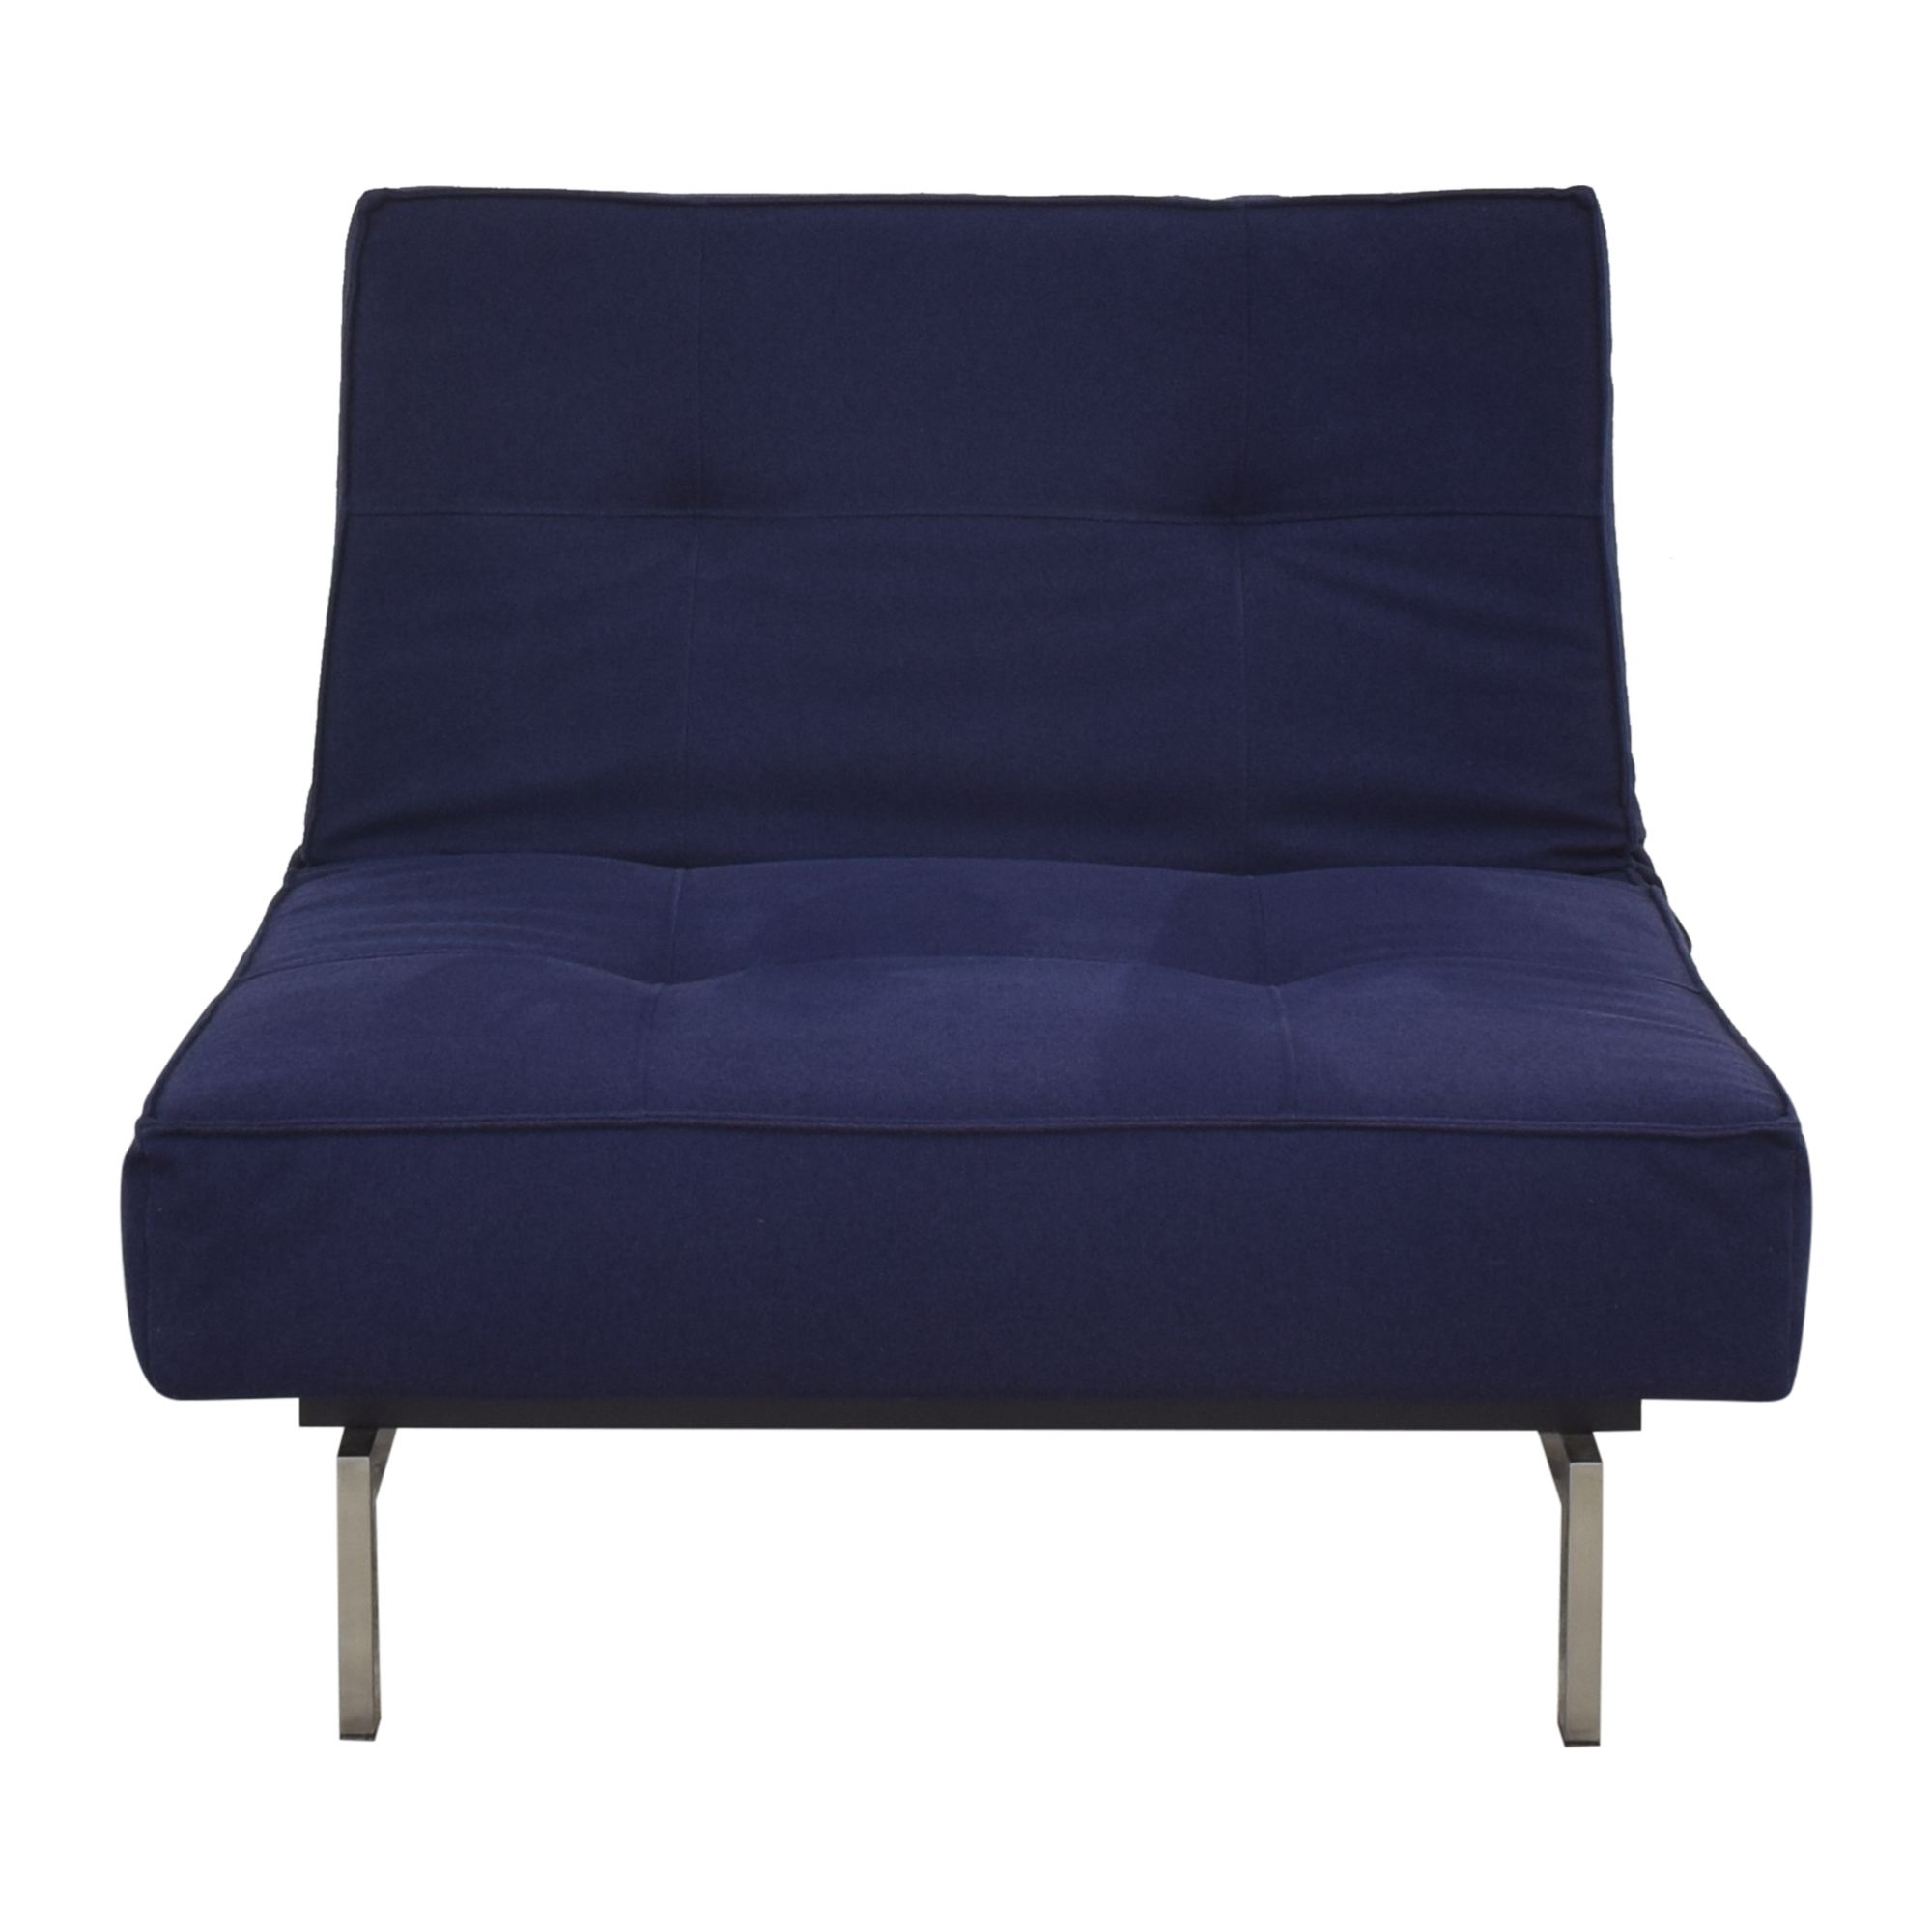 ABC Carpet & Home ABC Carpet & Home Convertible Lounge Chair ct